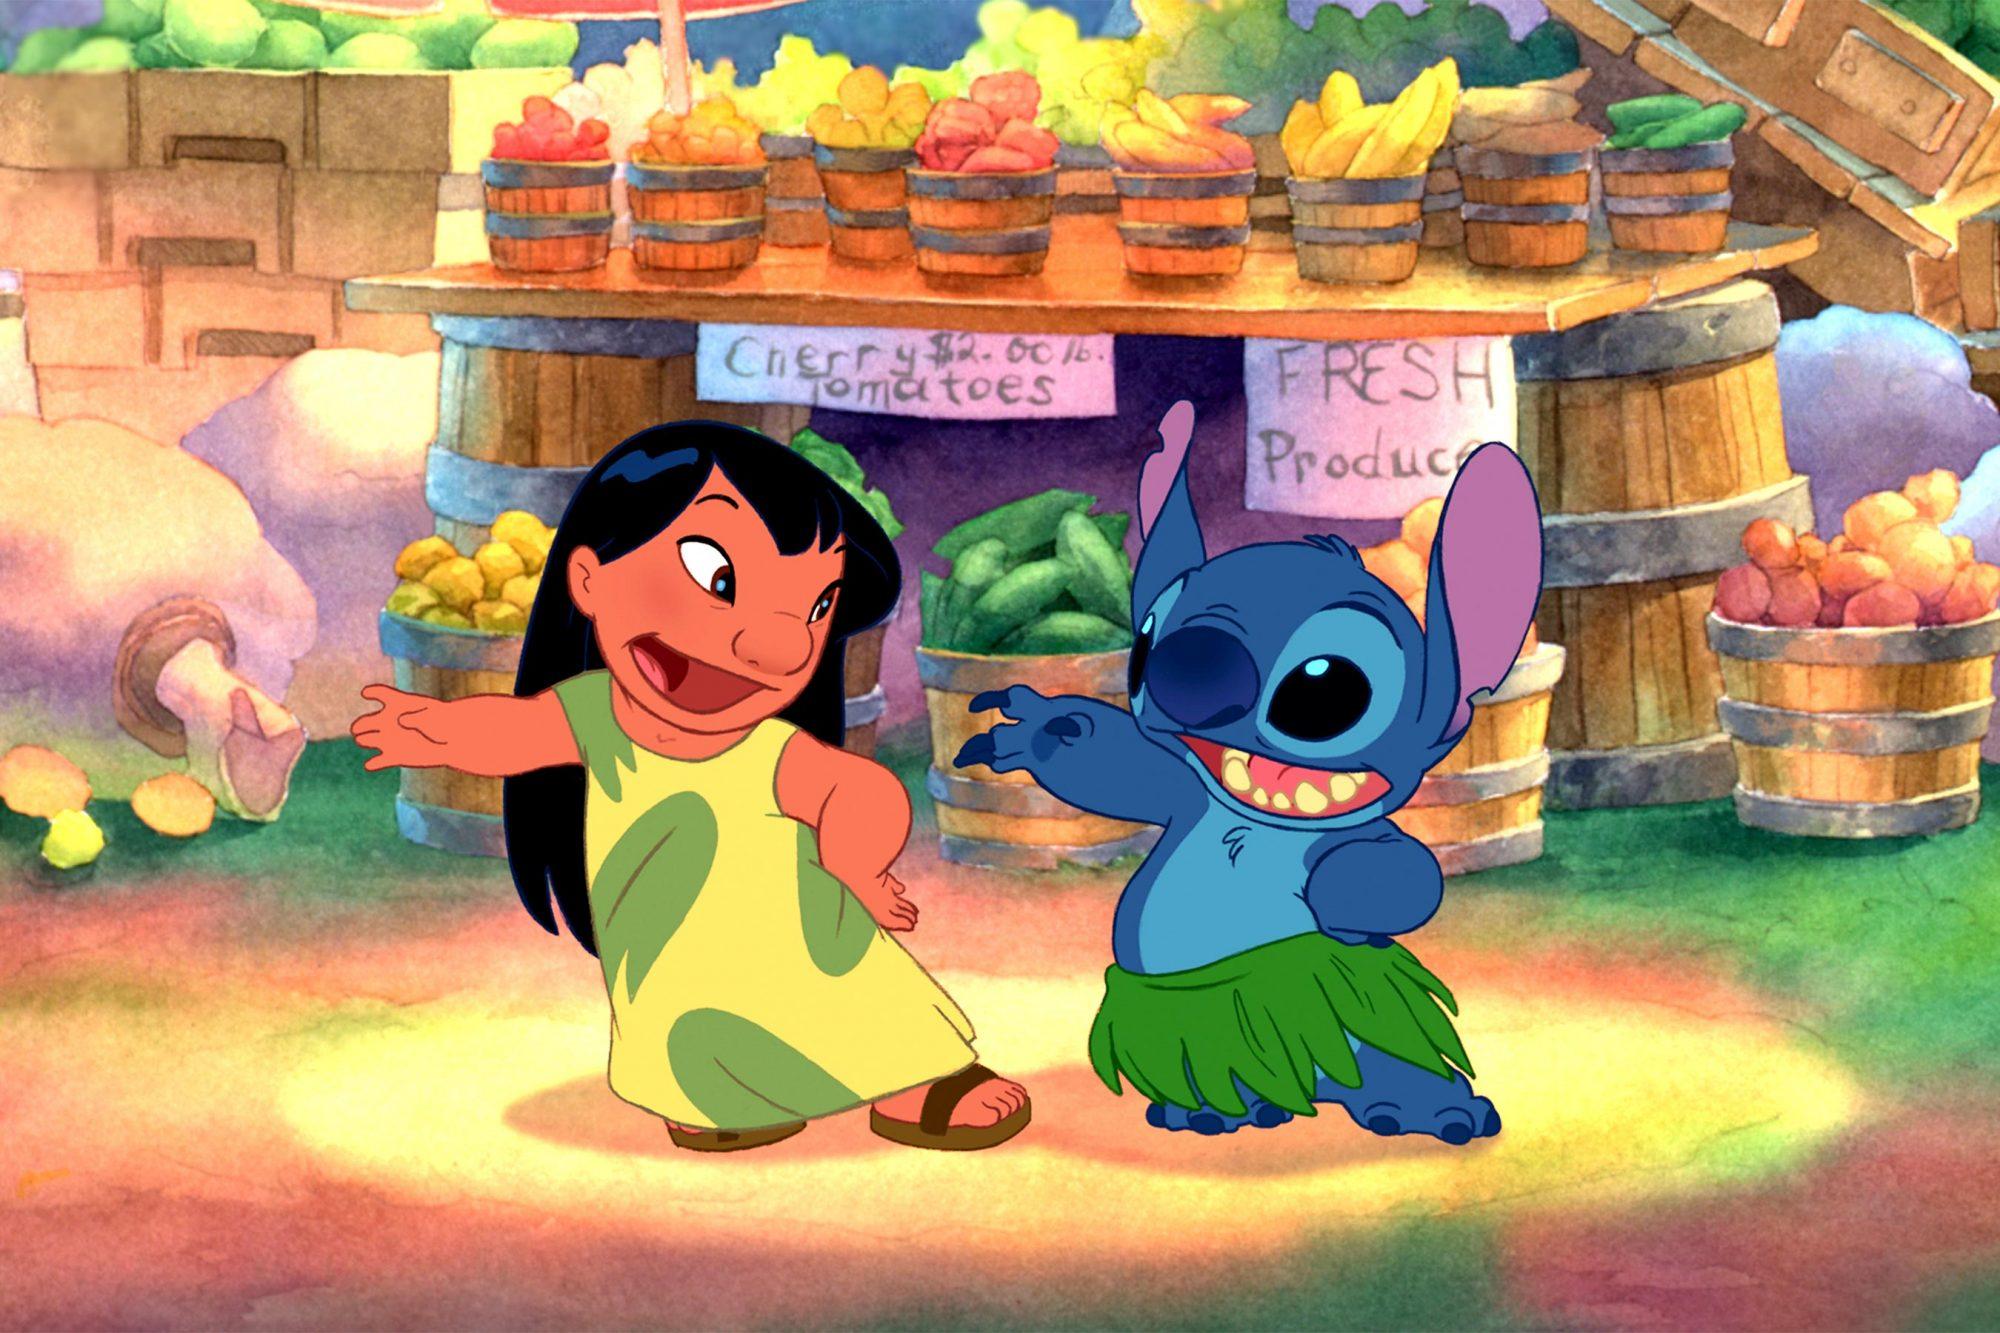 LILO & STITCH, Lilo, Stitch, 2002 (c) Walt Disney/courtesy Everett Collection.